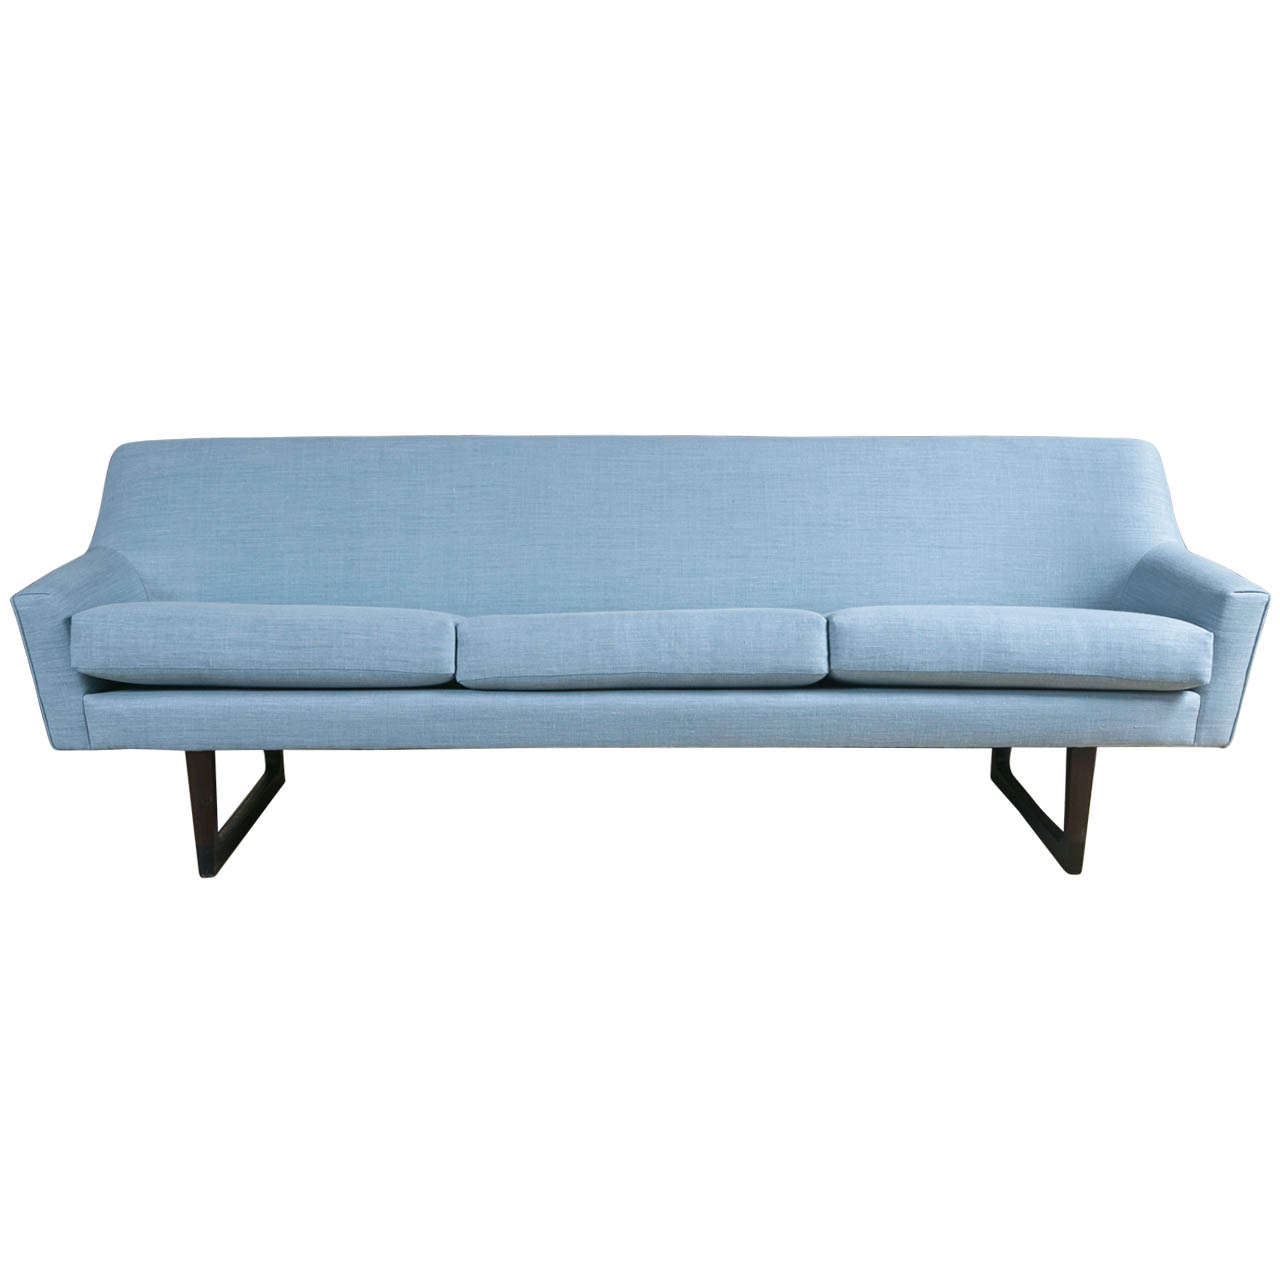 Midcentury Danish Modern Sofa at 1stdibs